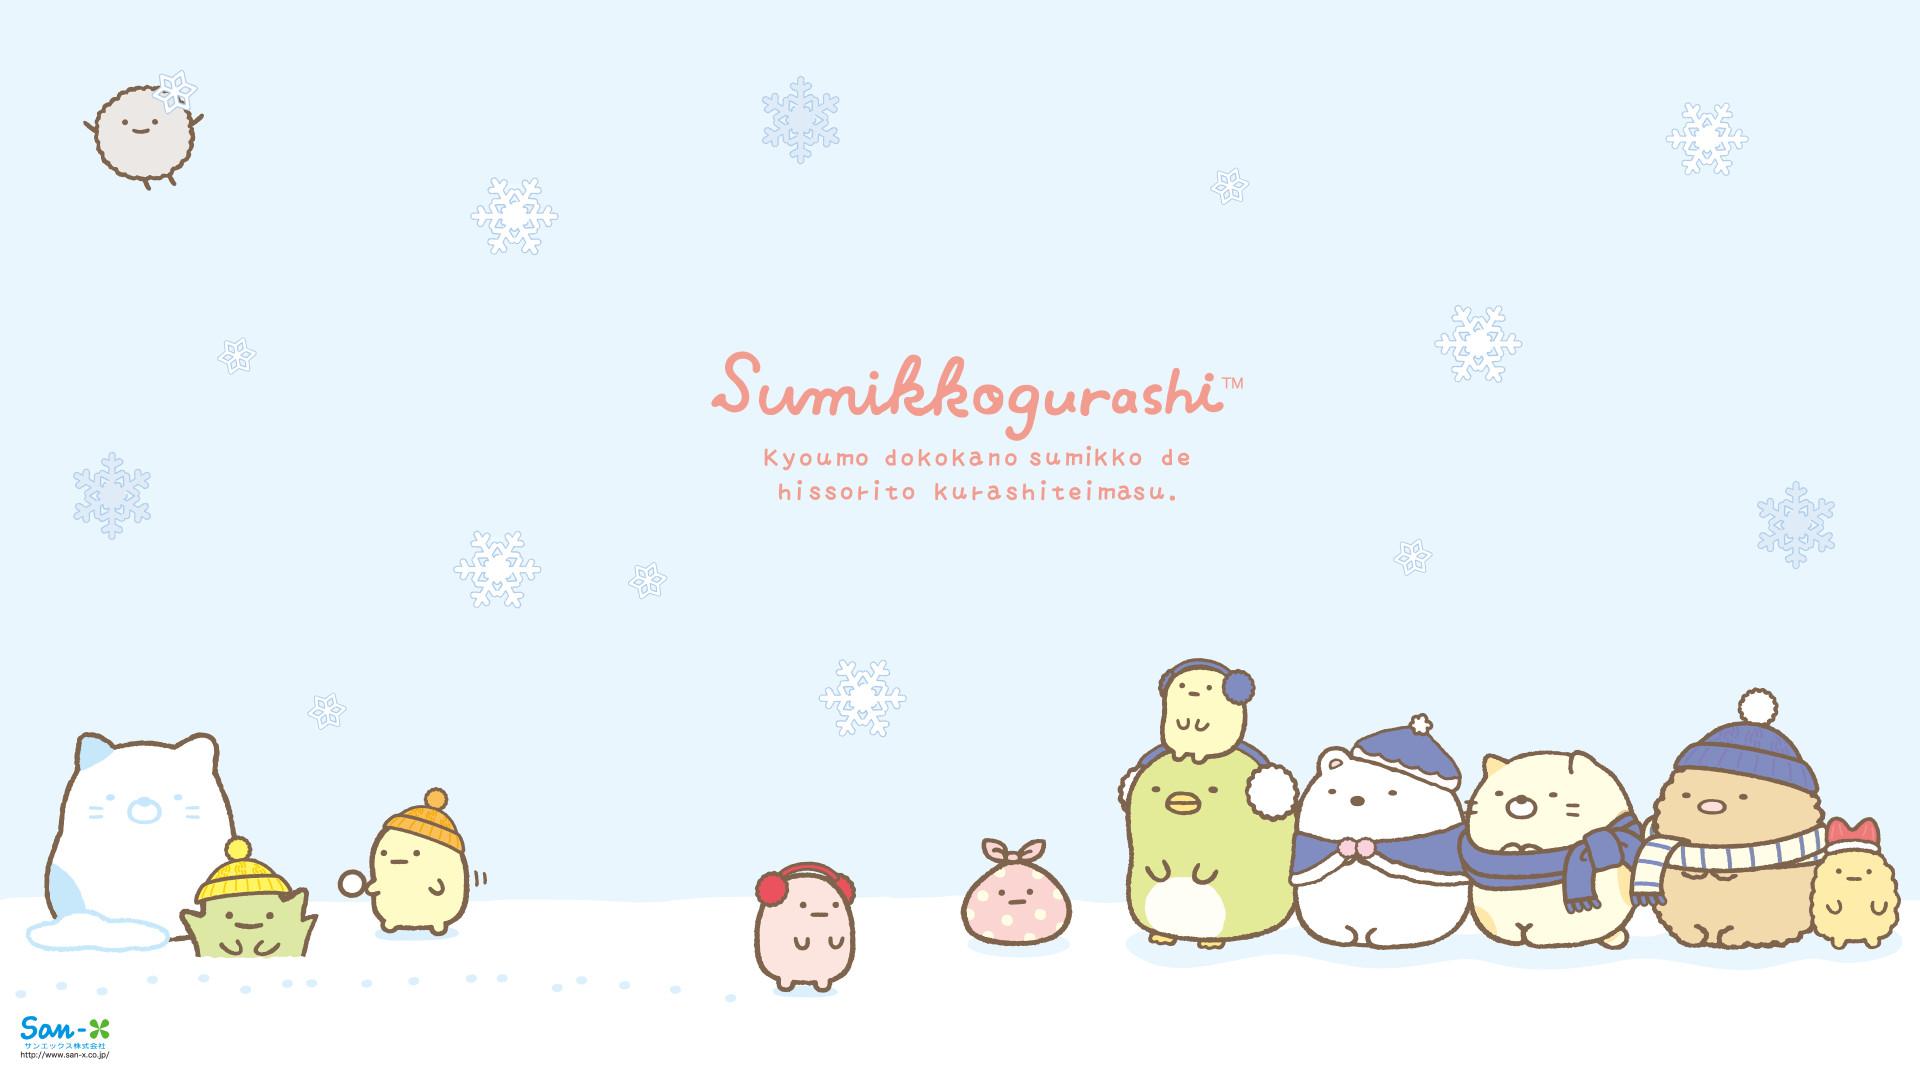 New Sumikkogurashi Christmas Wallpaper